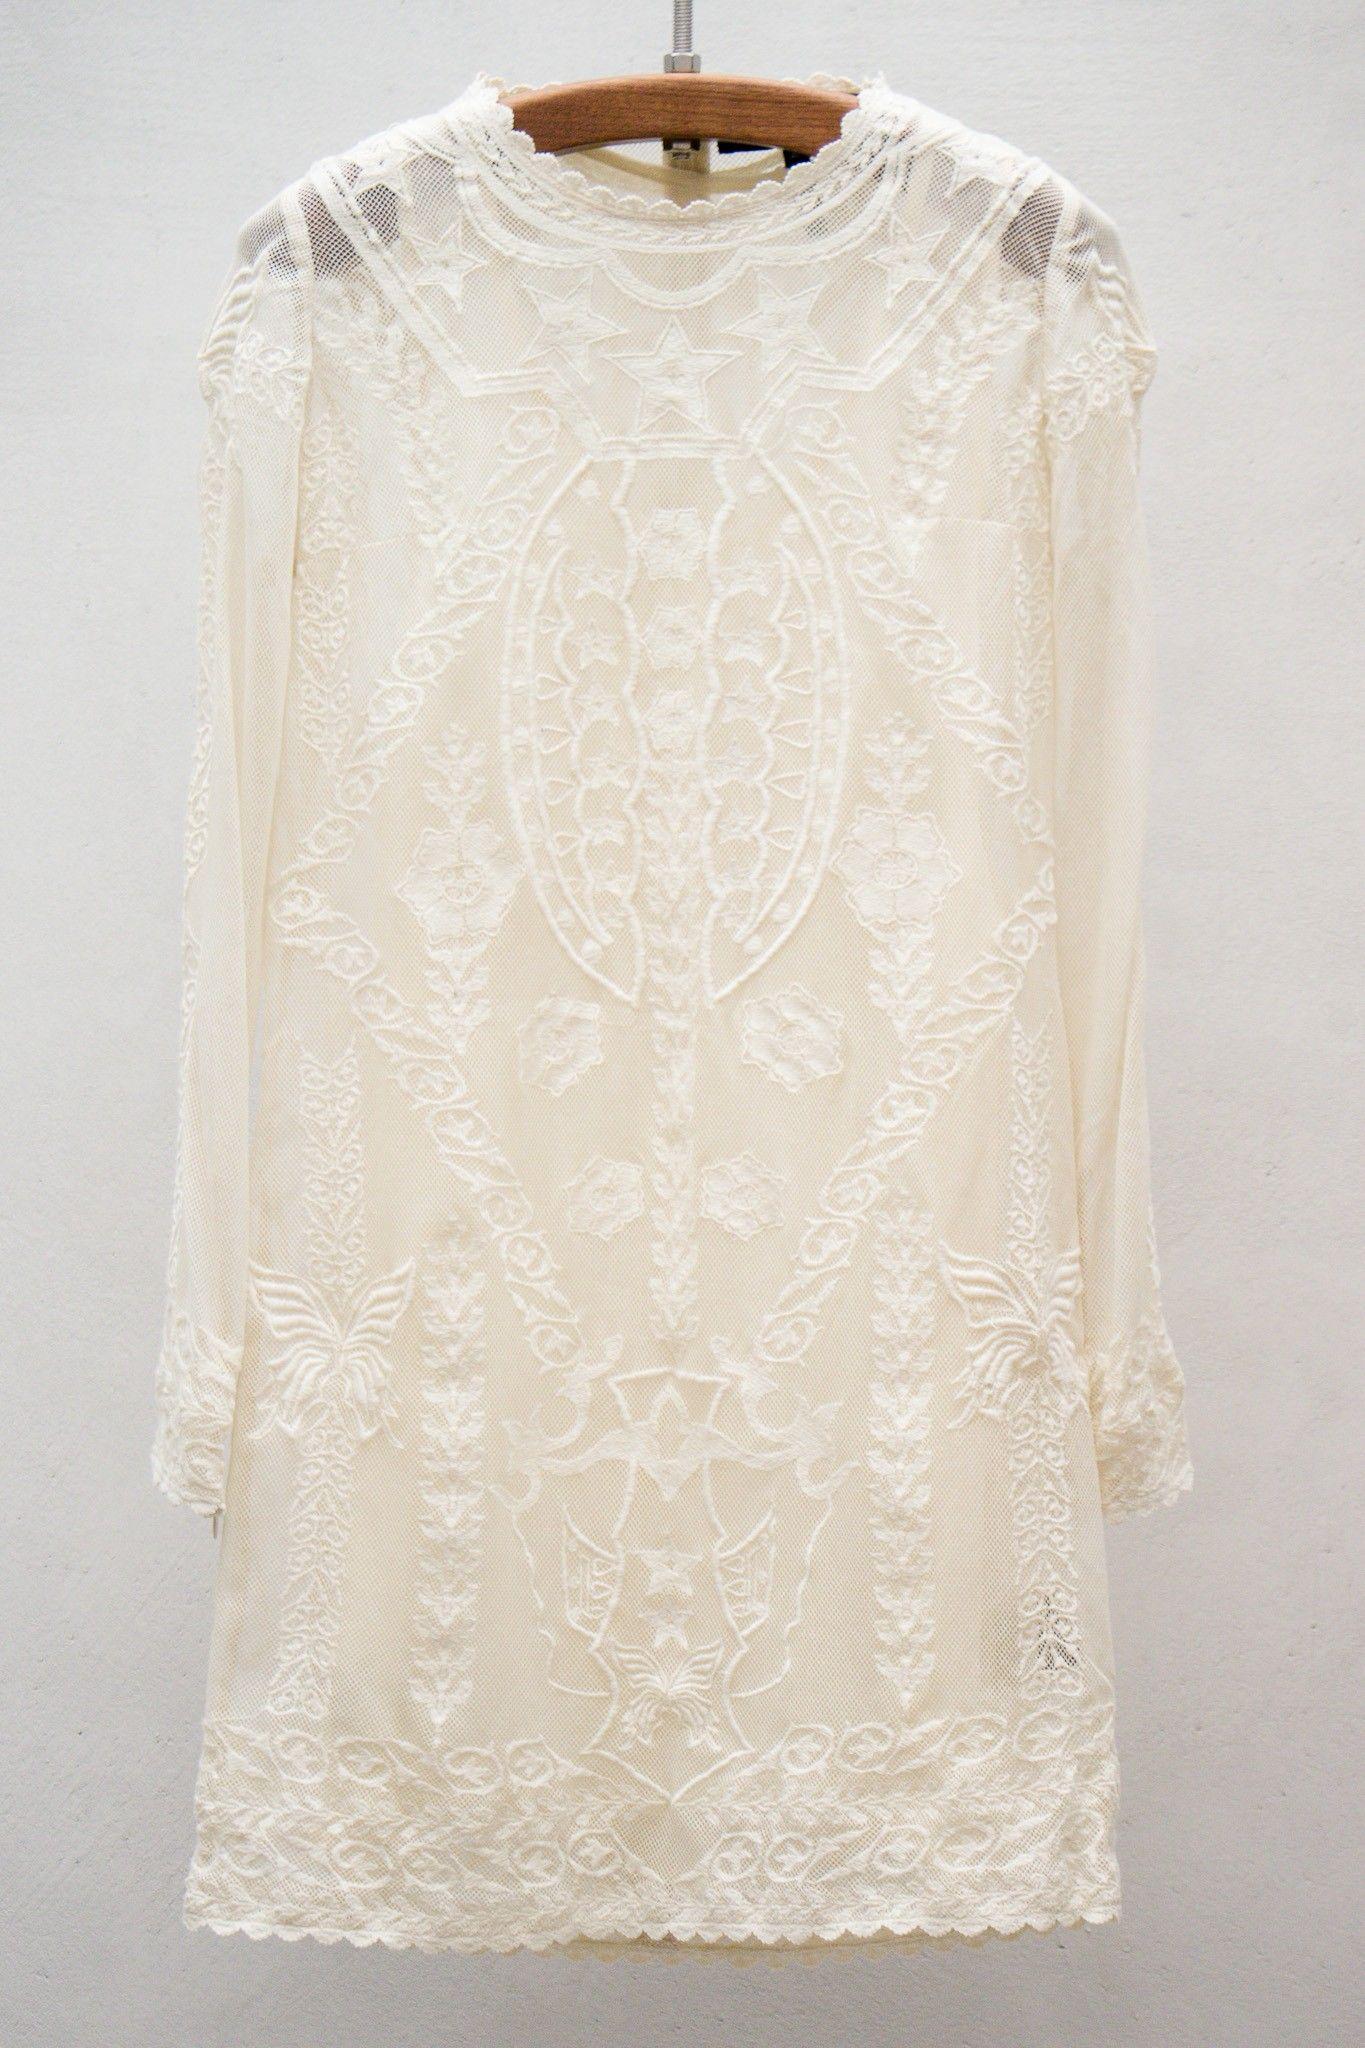 Untraditional wedding dresses  Isabel Marant Lace Dress  My Style  Pinterest  Isabel marant